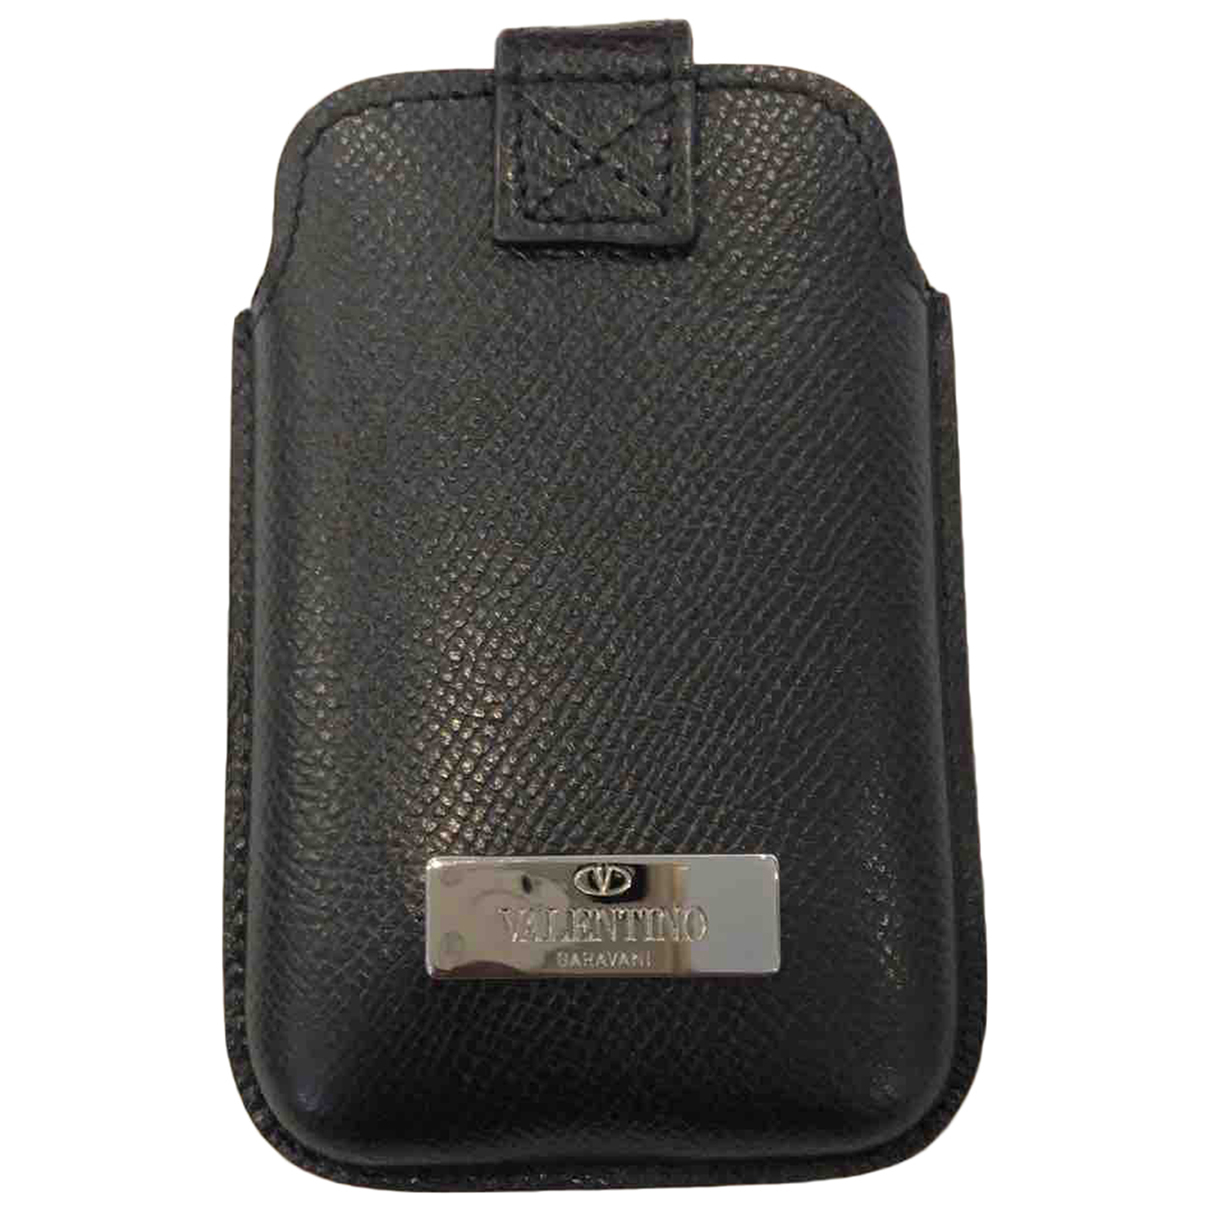 Valentino Garavani N Black Leather Purses, wallet & cases for Women N